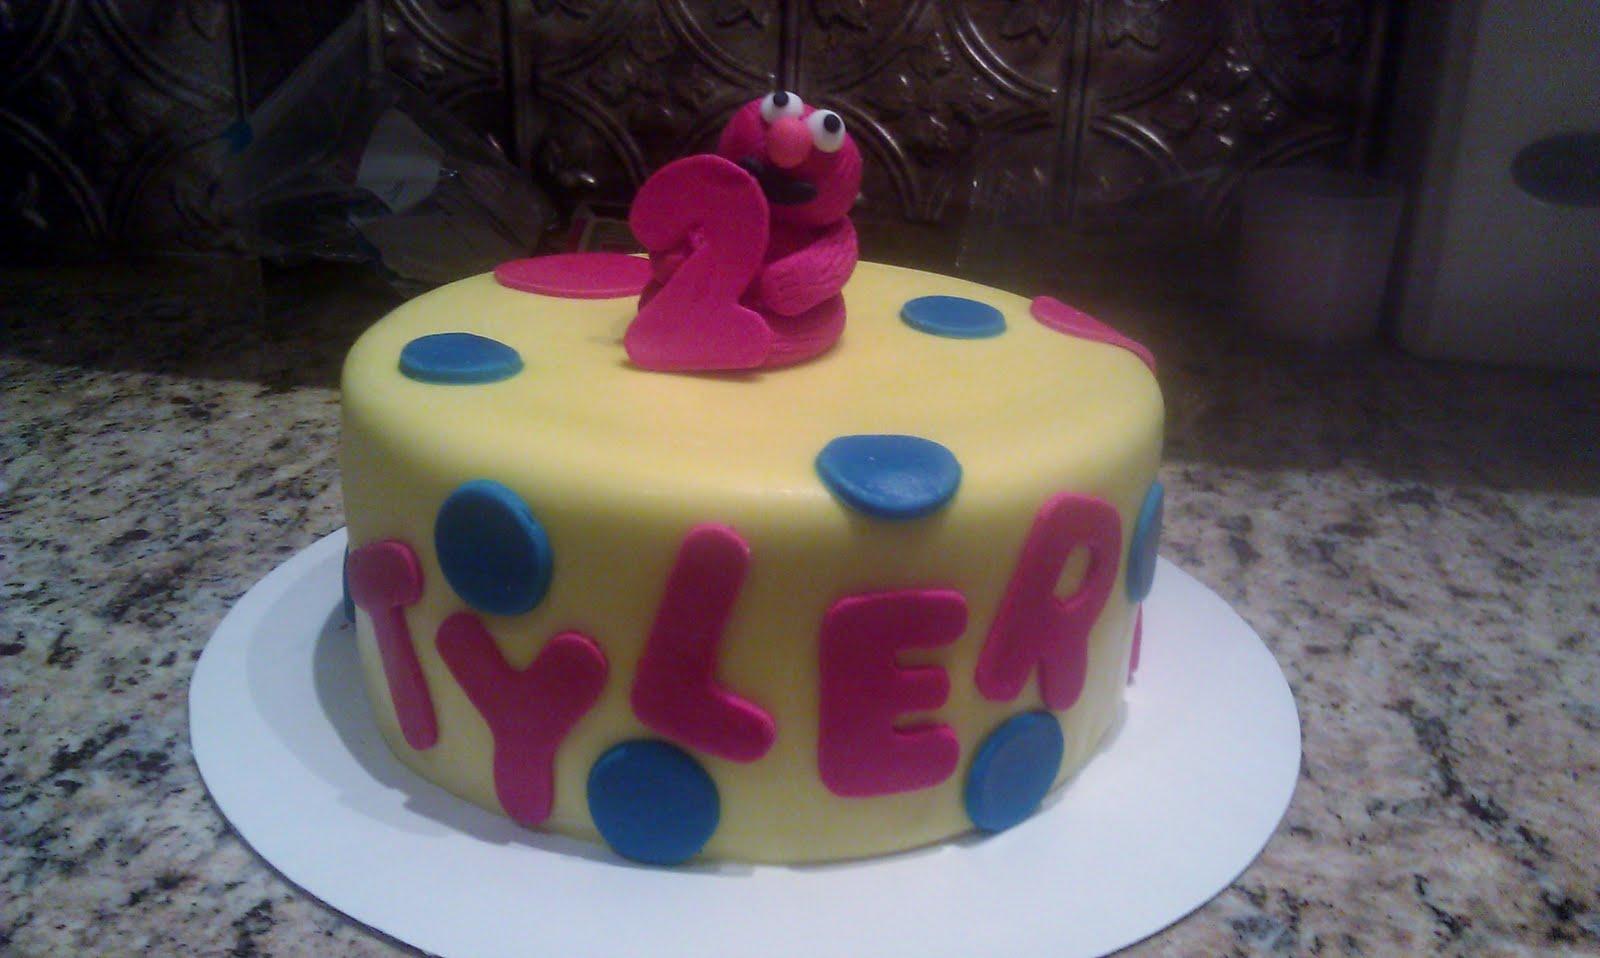 Zebra Cake Recipe Joy Of Baking: Tiers Of Joy: So Many Cakes, So Little Time